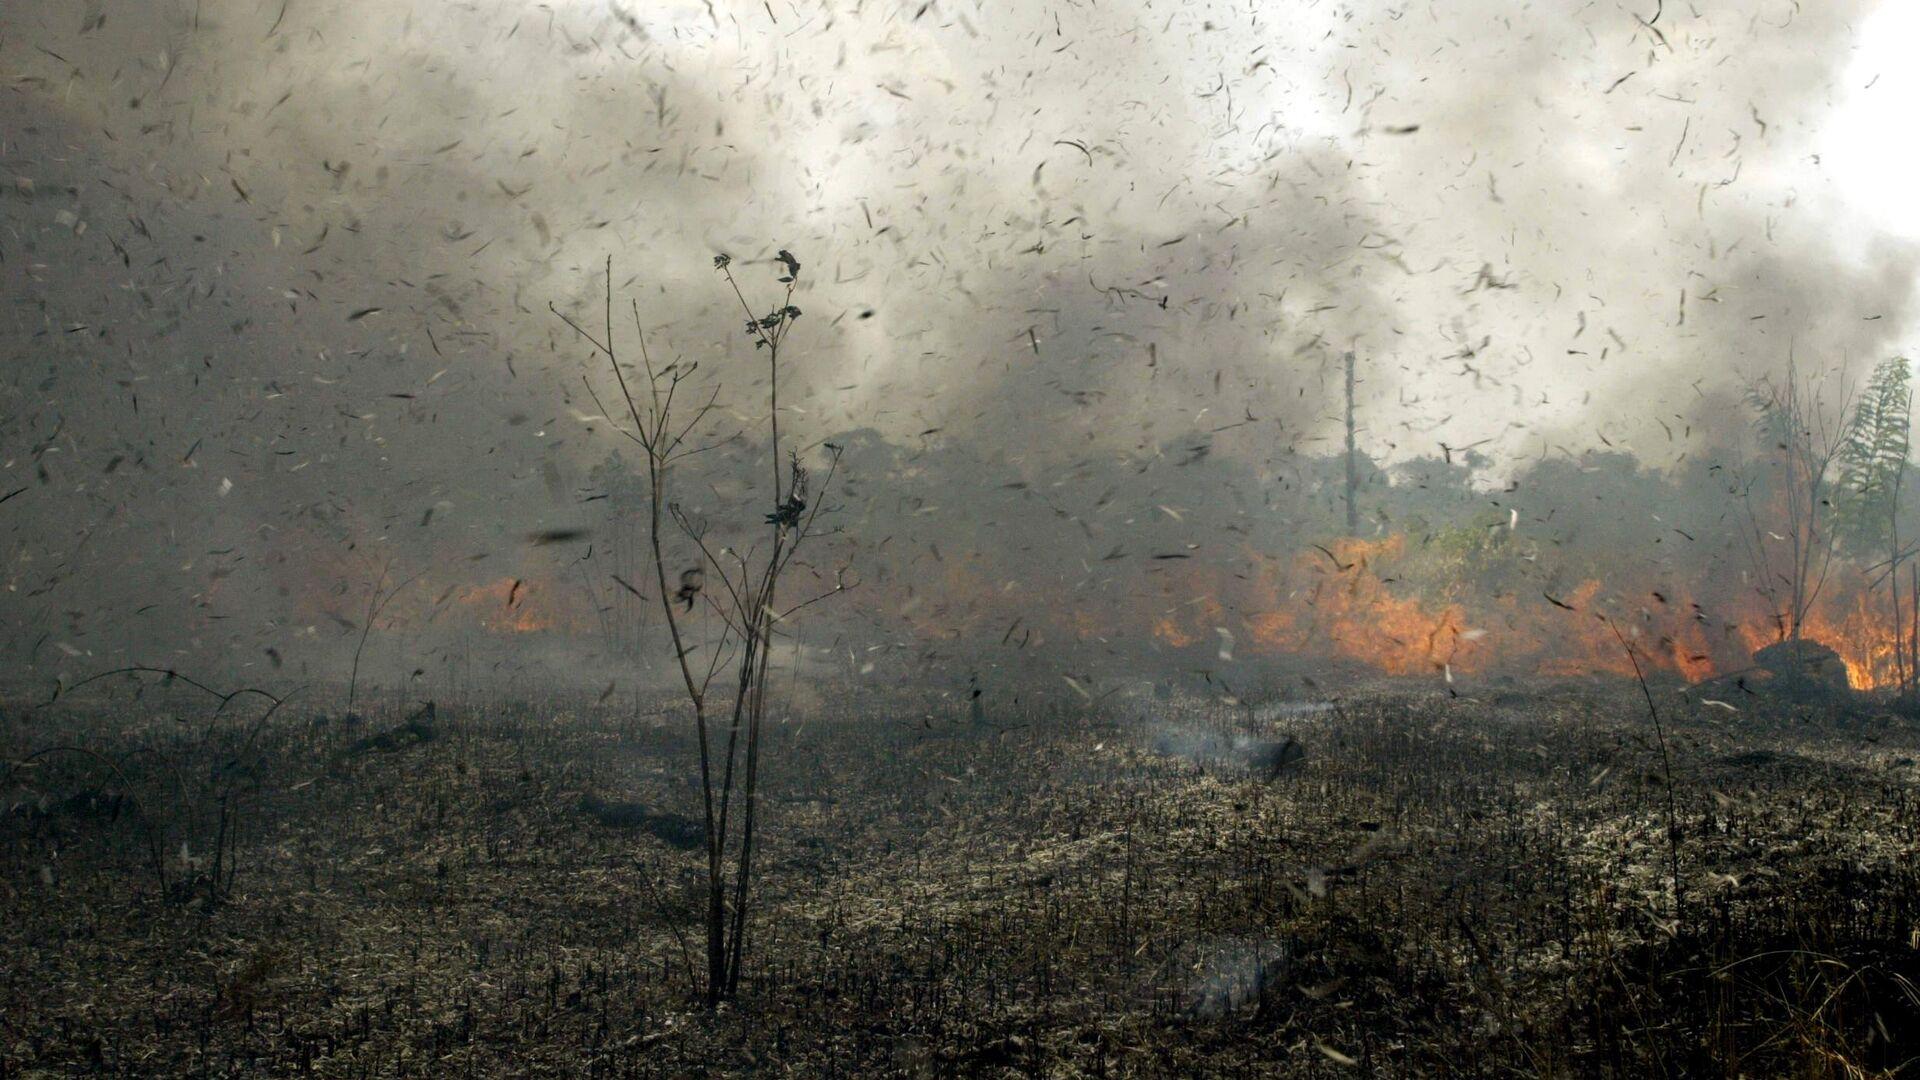 Los incendios forestales - Sputnik Mundo, 1920, 20.08.2021